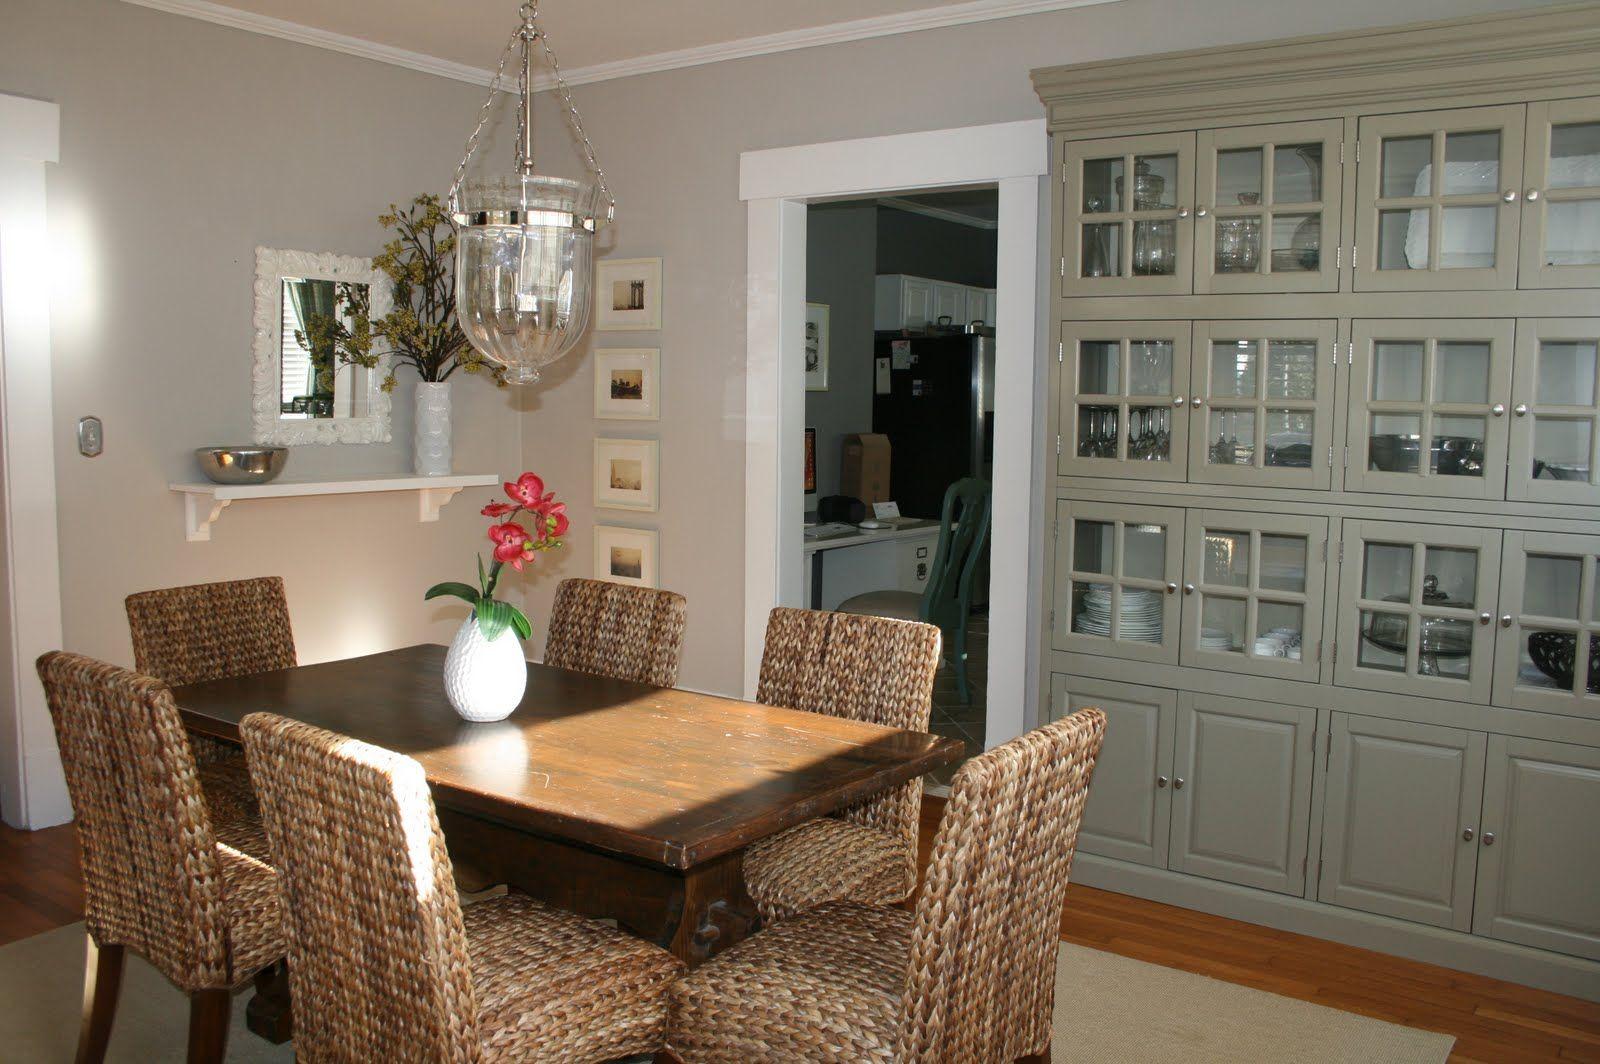 Martha Stewart Sharkey Grey Is Warm Neutral Gray For House With